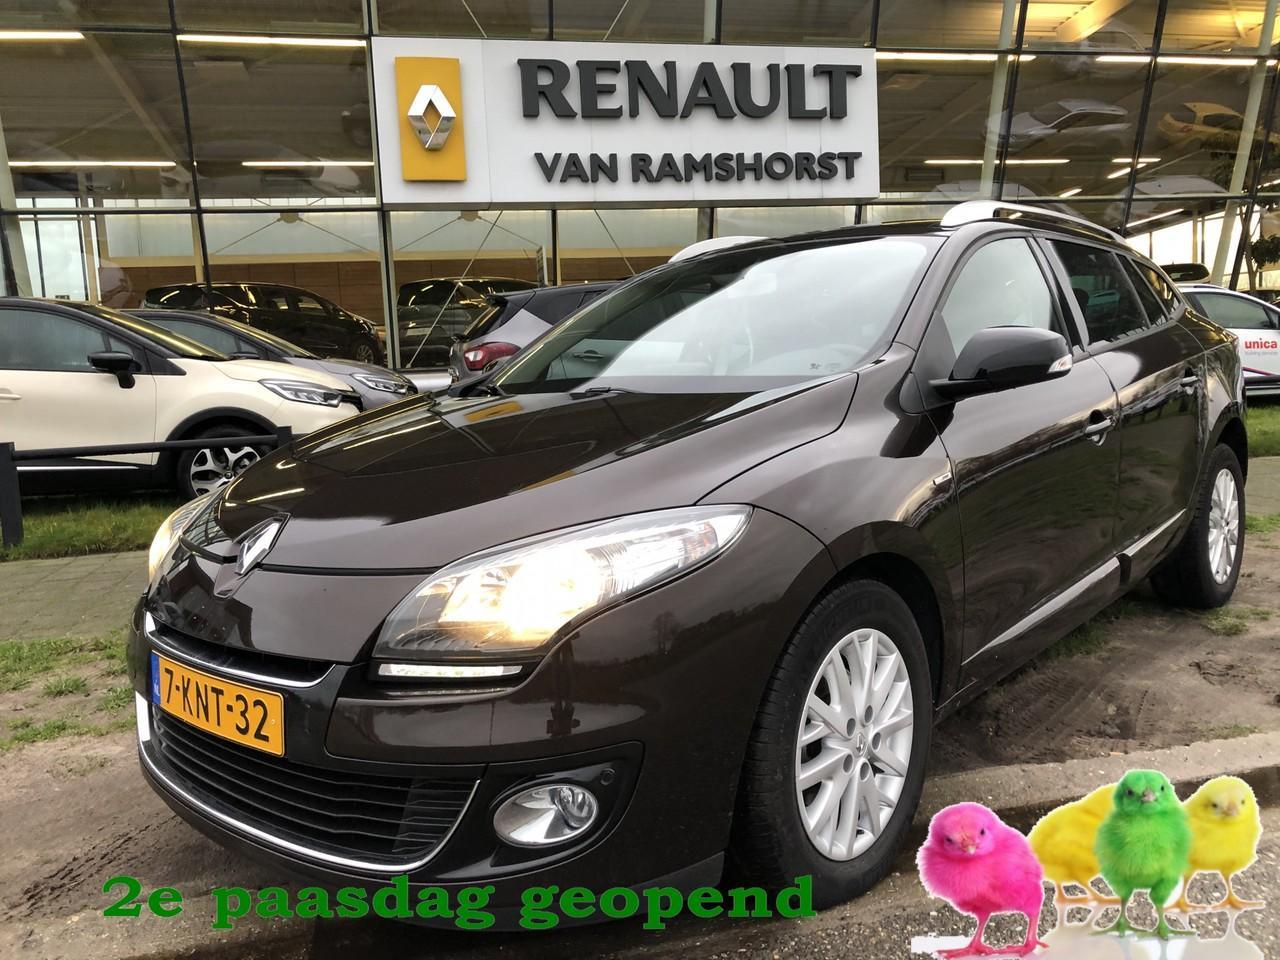 Renault Mégane Estate 1.5 dci 110 pk bose pan dak pdc v+a+cam 2e paasdag open 10.00 - 17.00 uur